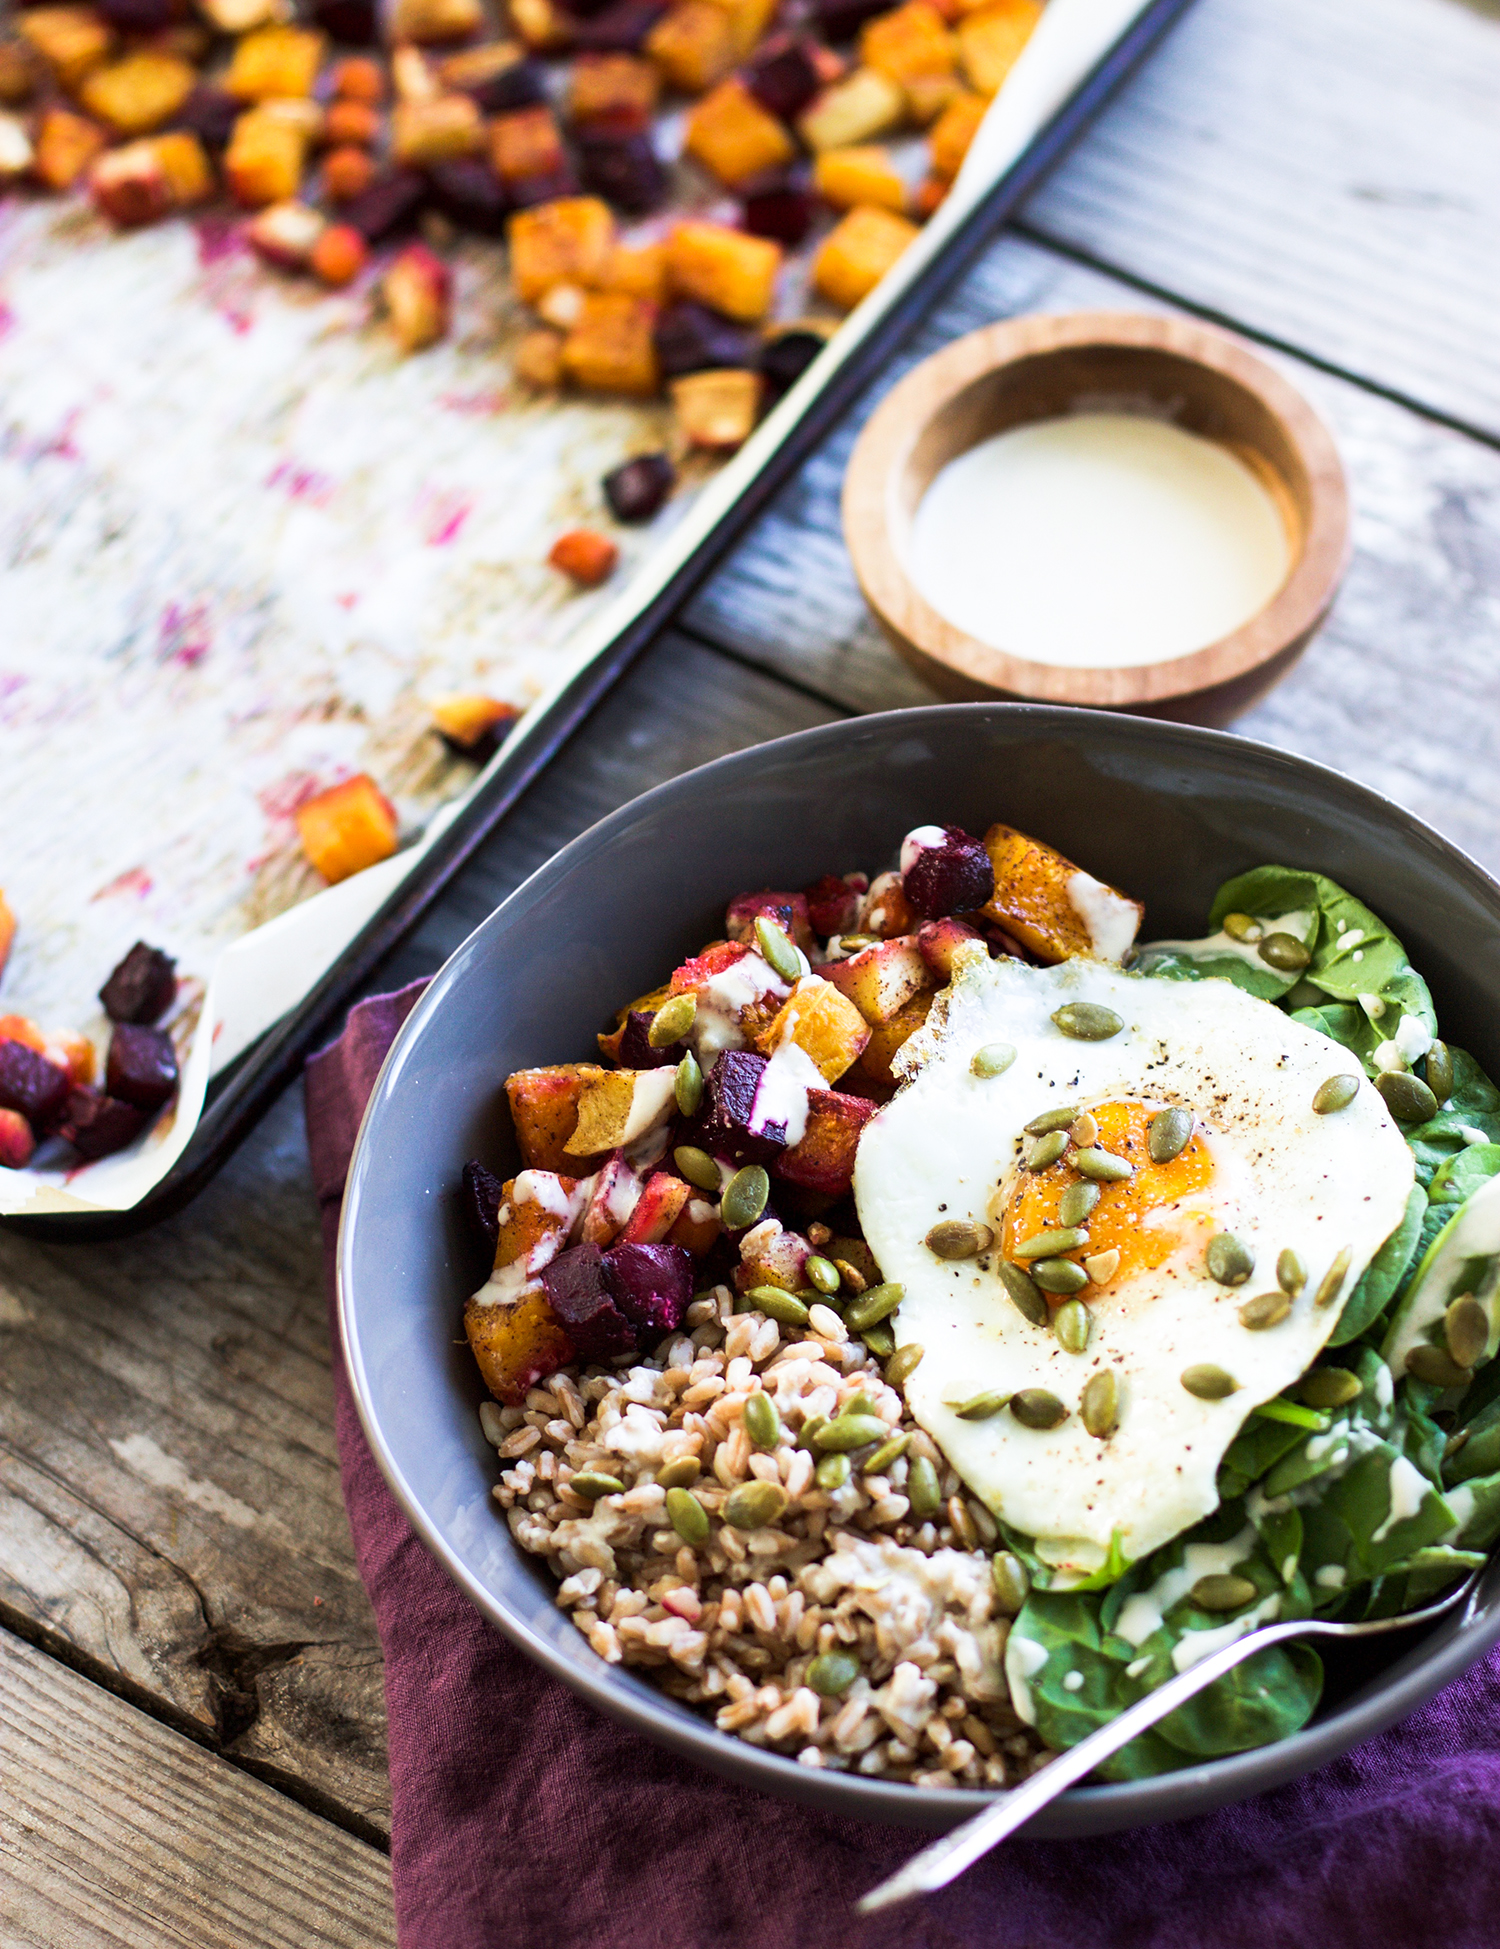 Healthy Autumn Nourish Bowls: My Diary of Us